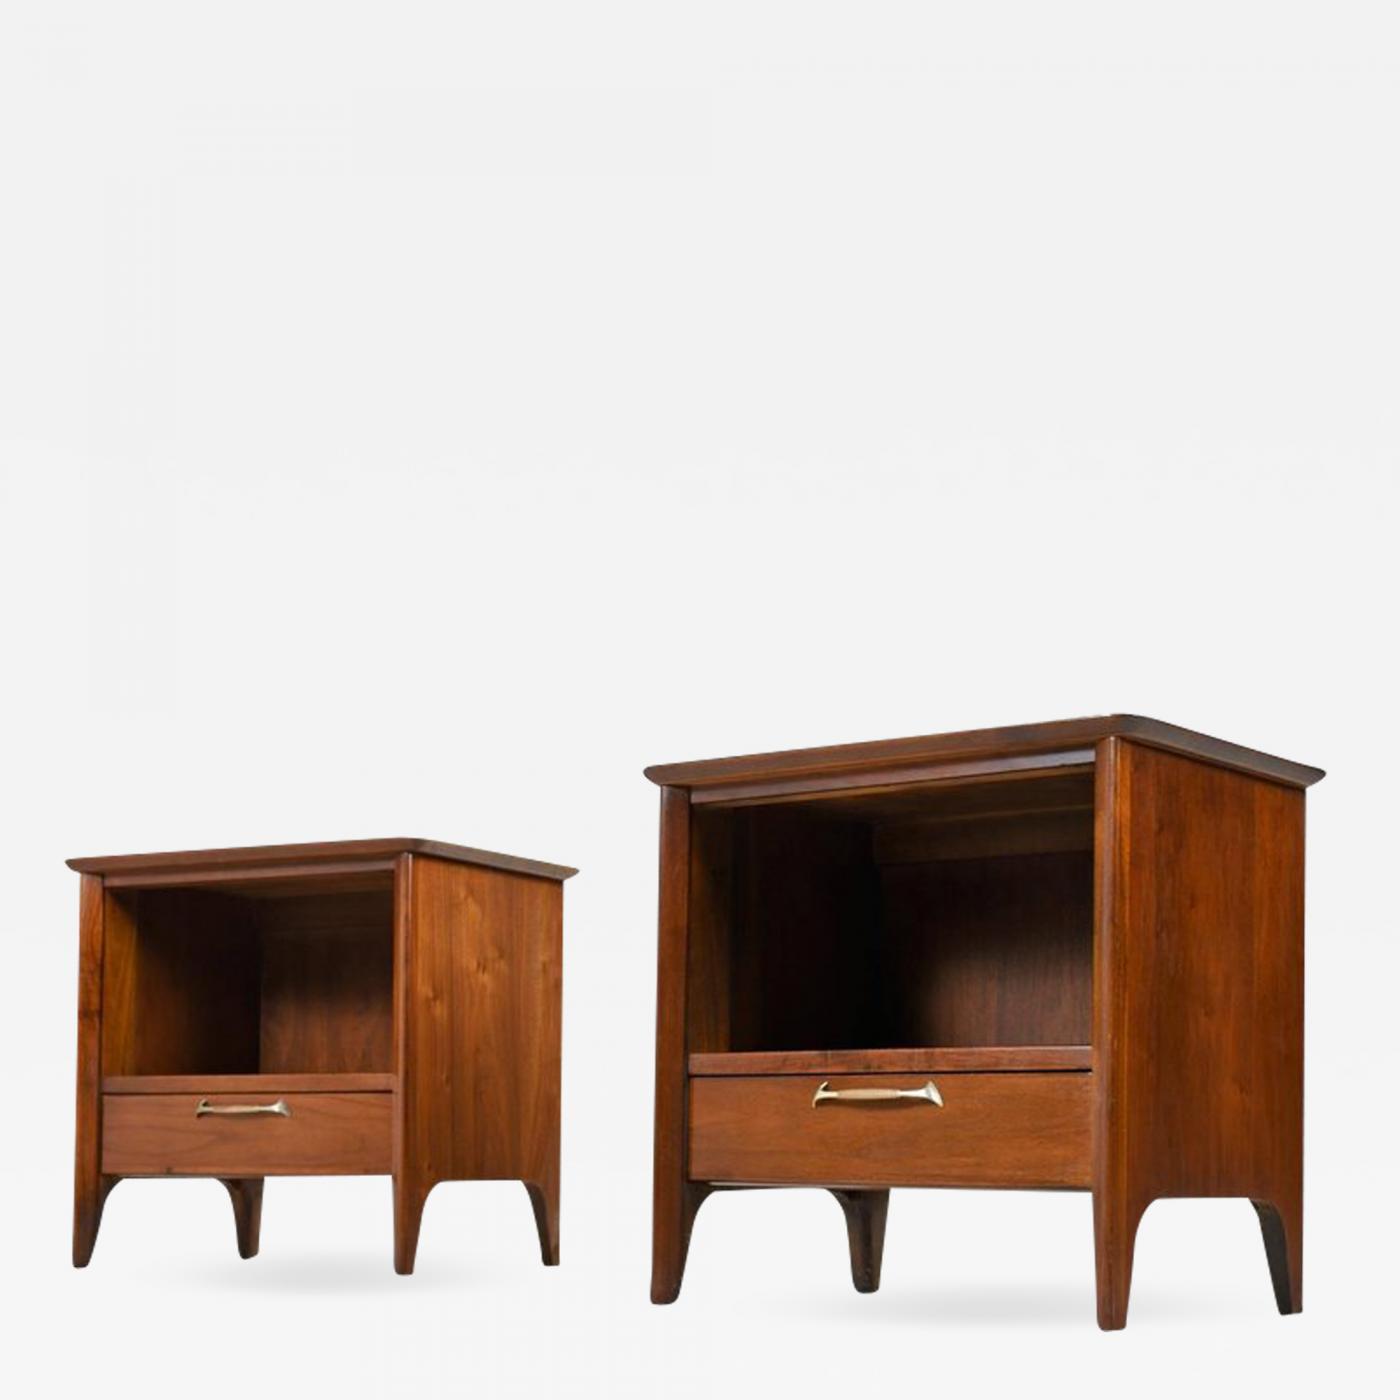 Pair of restored midcentury drexel modern walnut nightstands circa 1950s